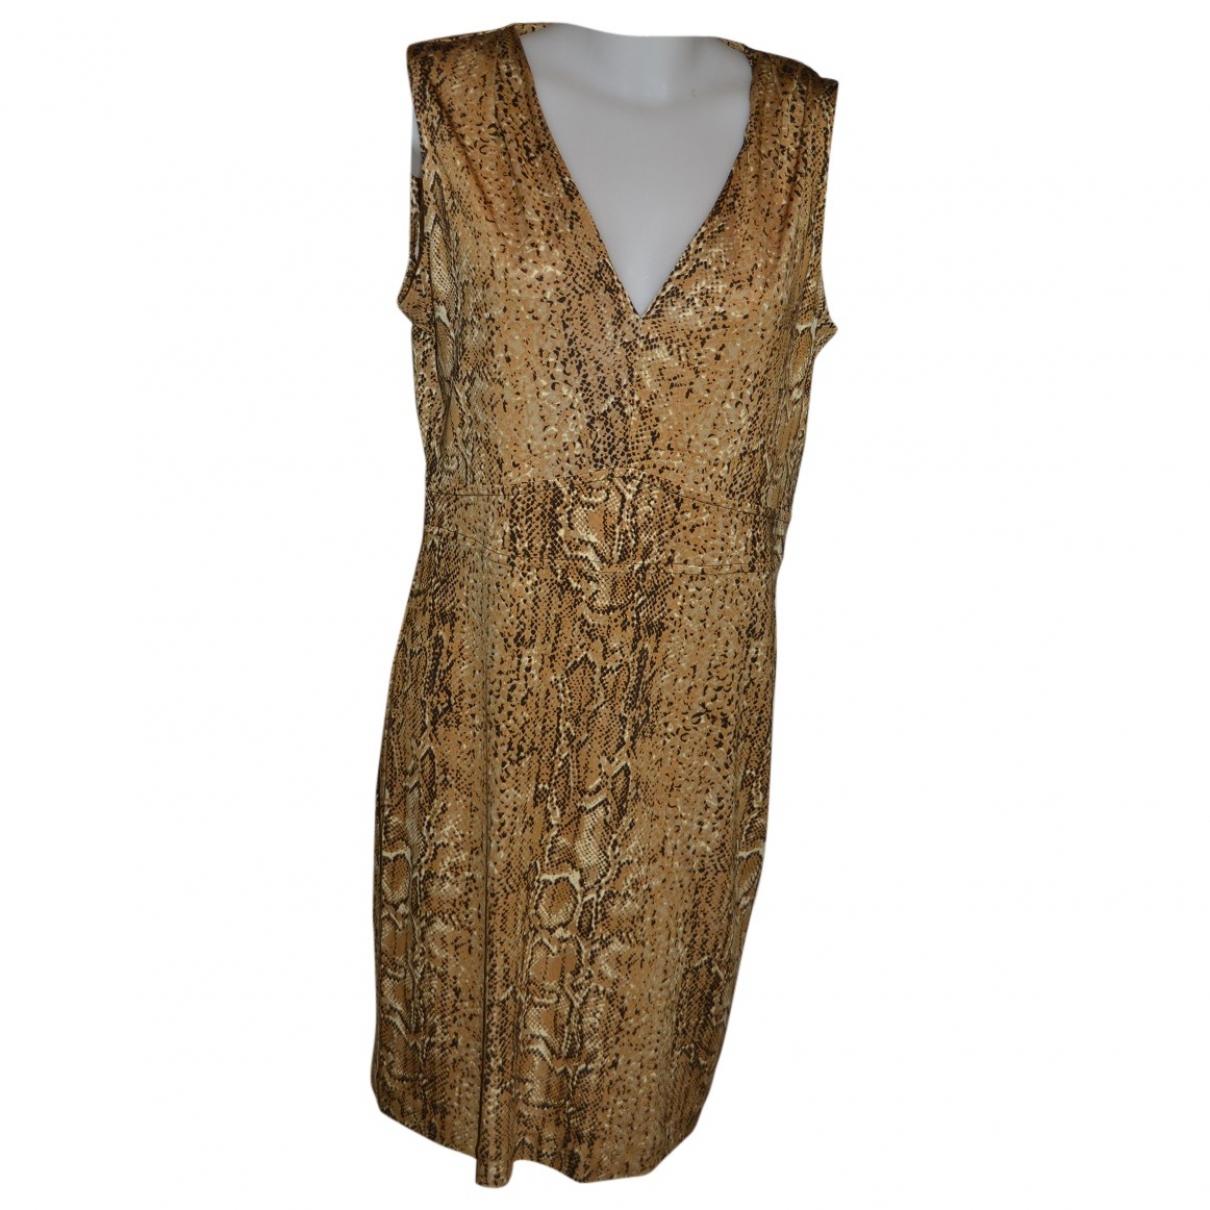 Tory Burch \N Beige Silk dress for Women L International